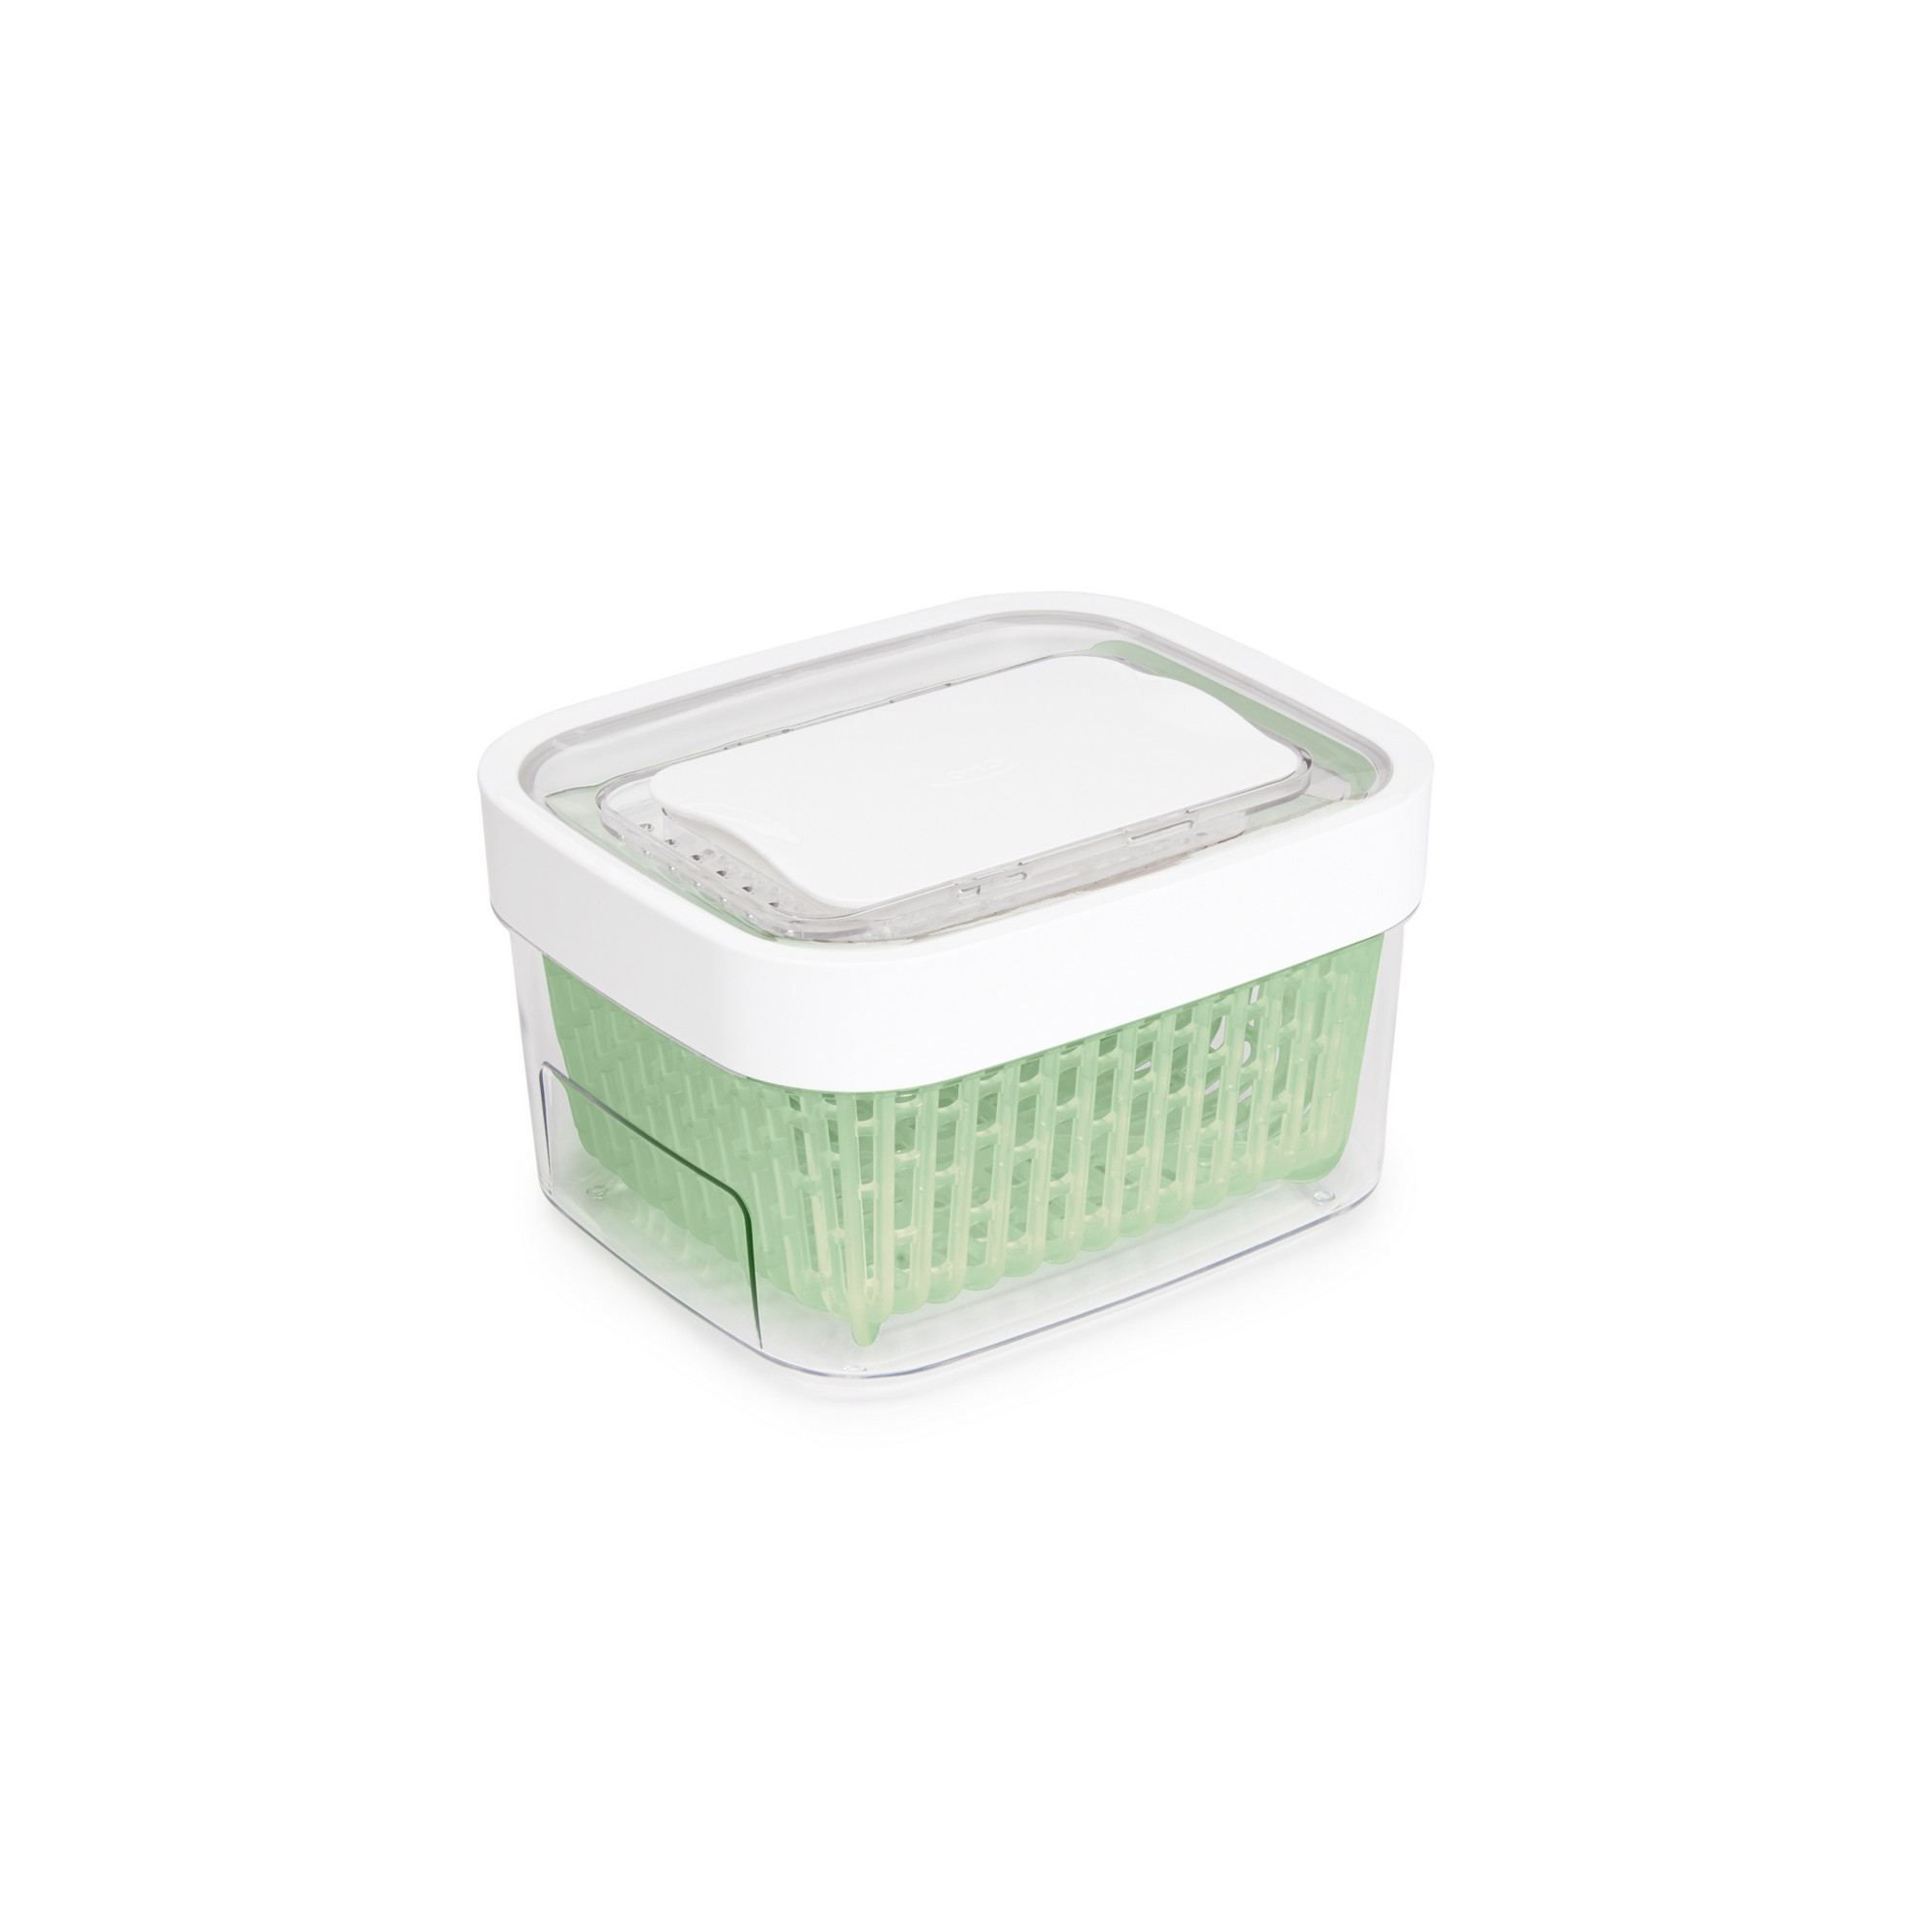 Pote Pequeno Oxo GreenSaver 1,5 litro